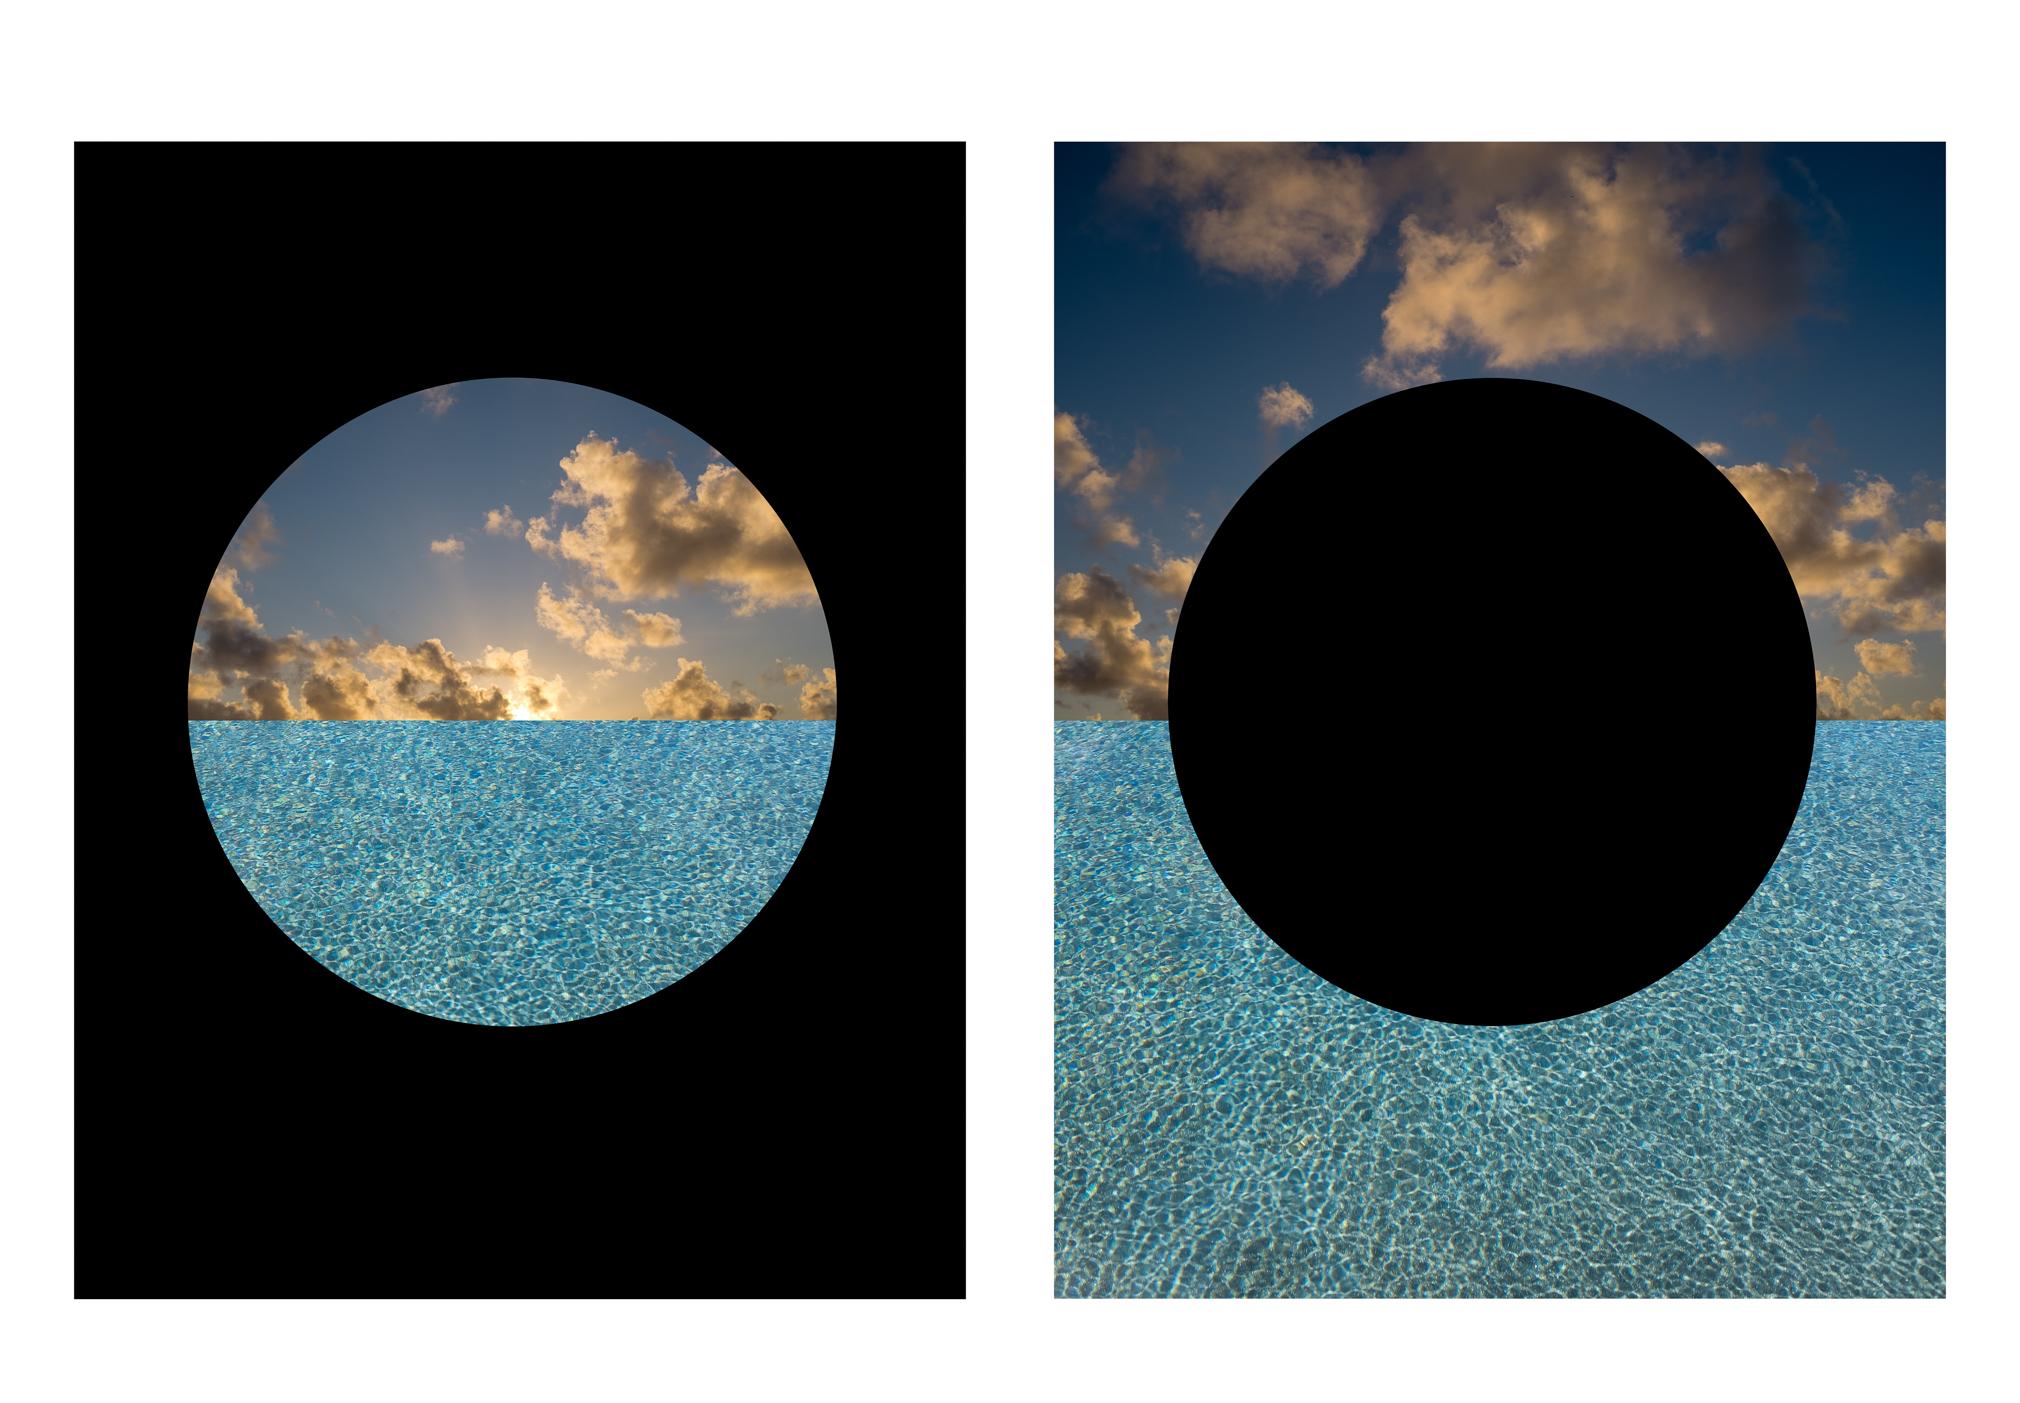 Black Circle Negative & Positive